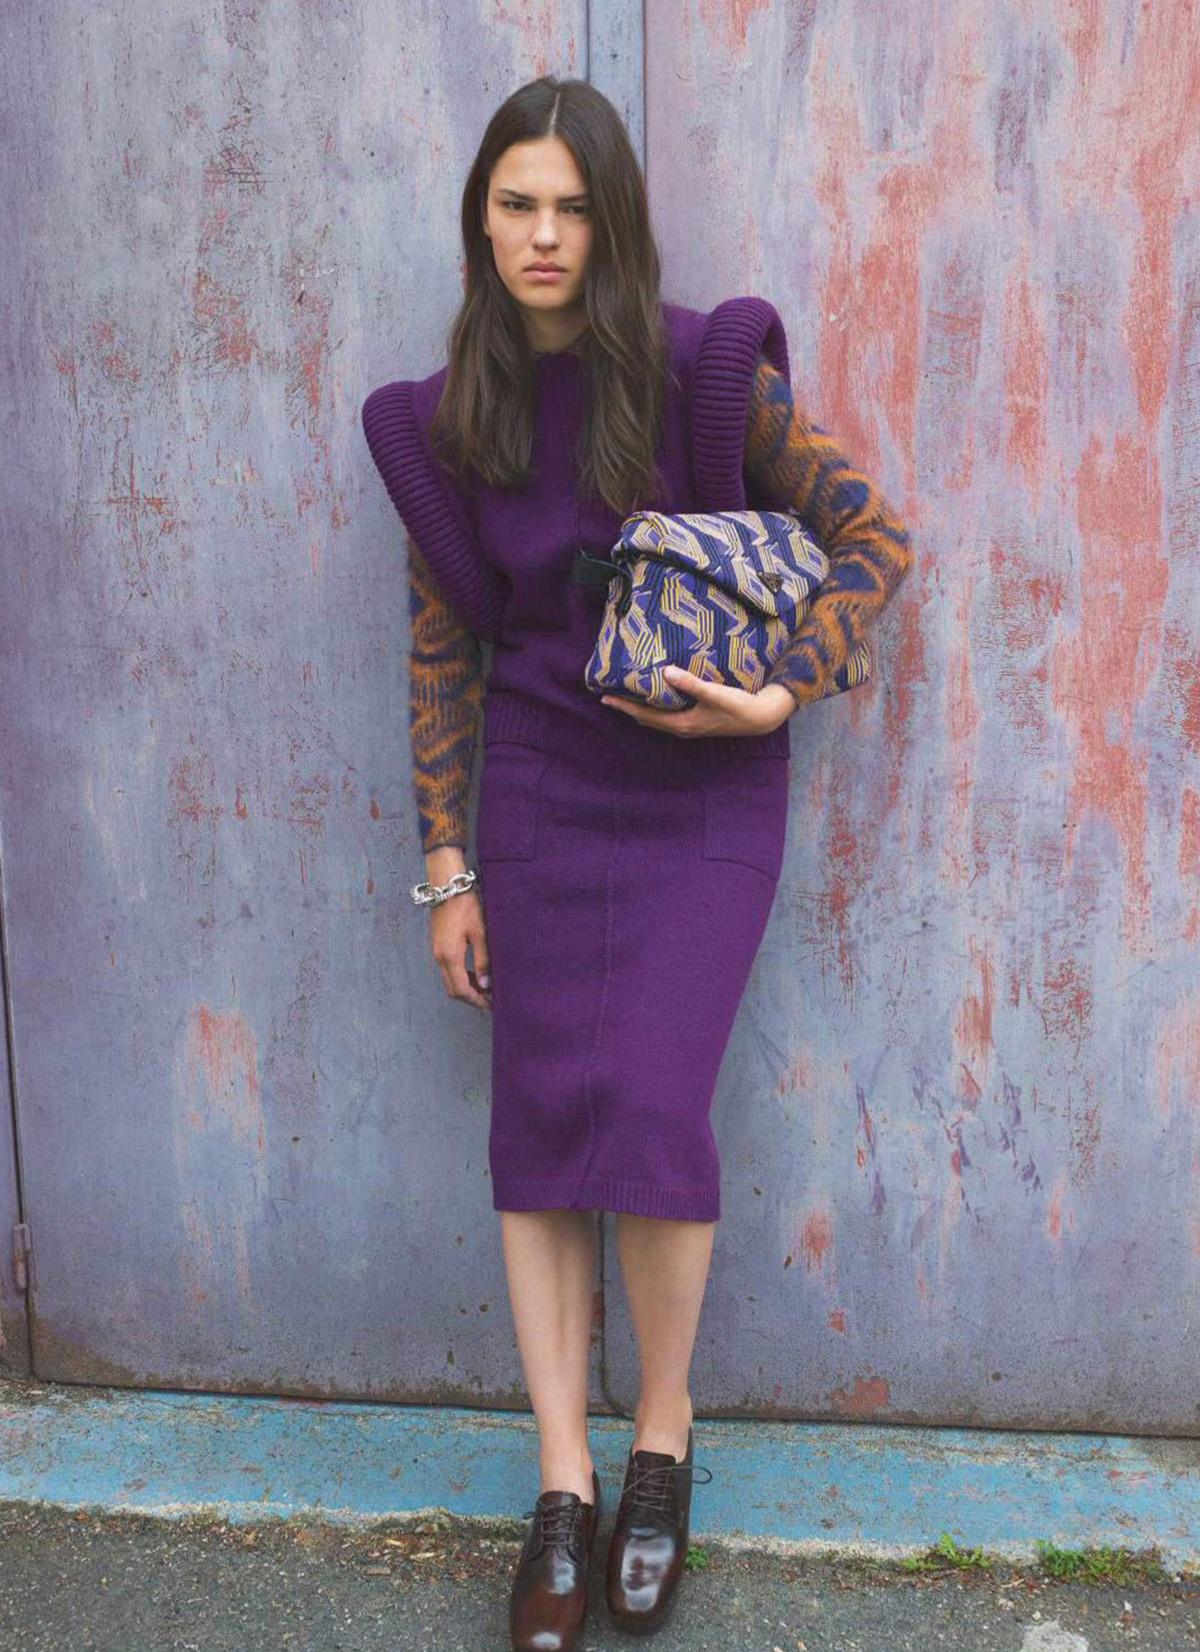 Matea Brakus by Julia Champeau for Elle France September 10th, 2021